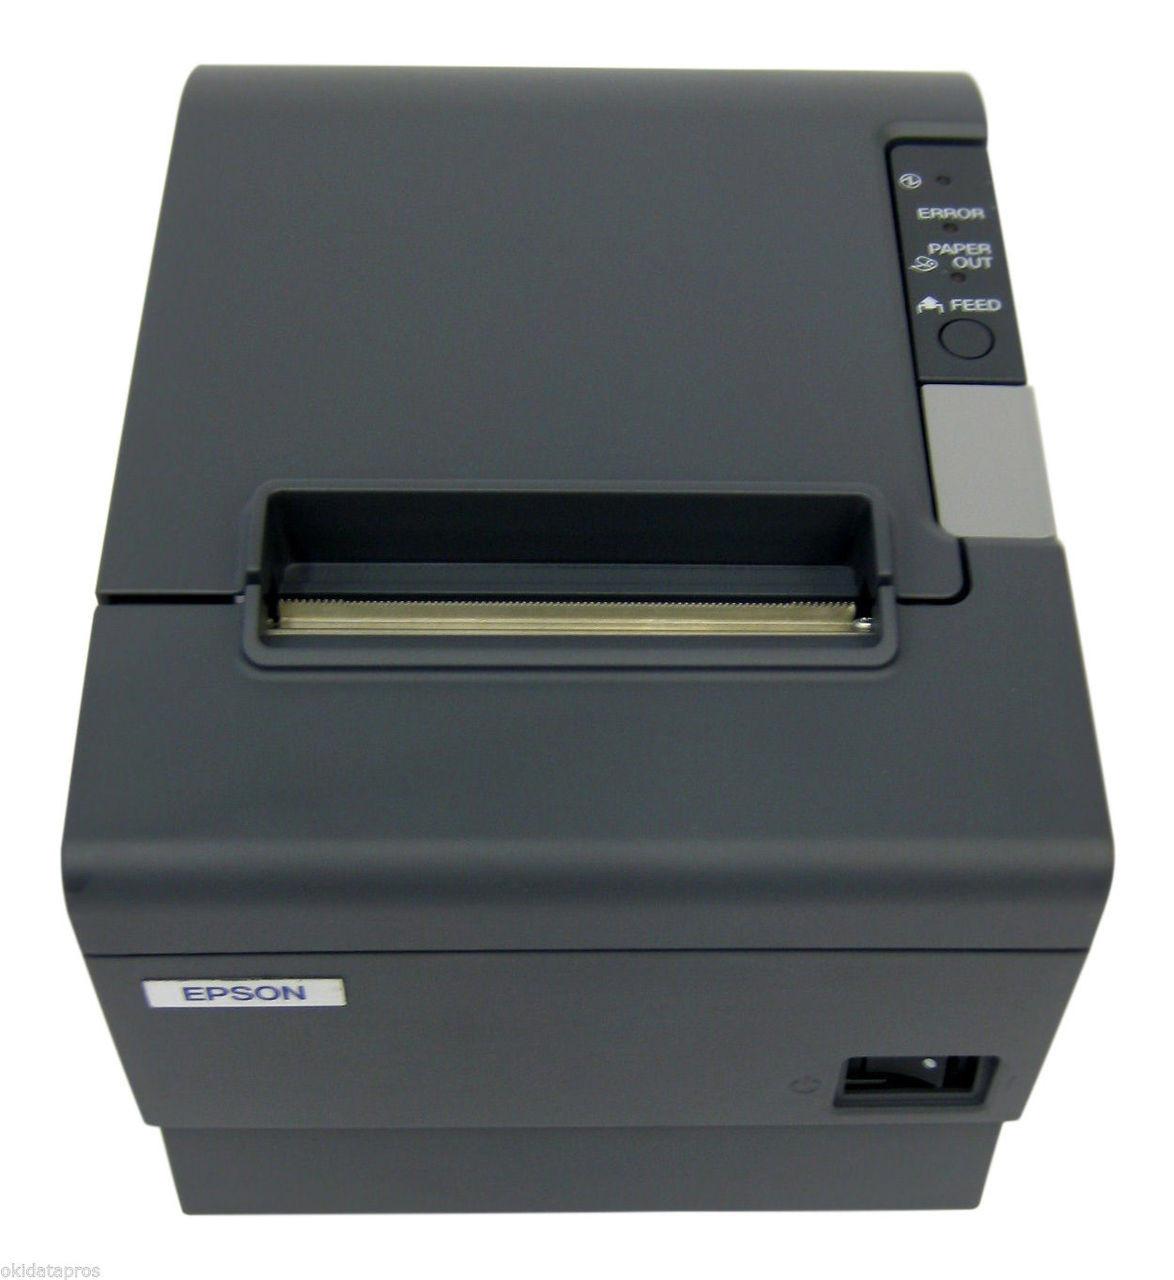 Epson Tm T88iv M129h Dark Gray Thermal Receipt Printer Ethernet Interface